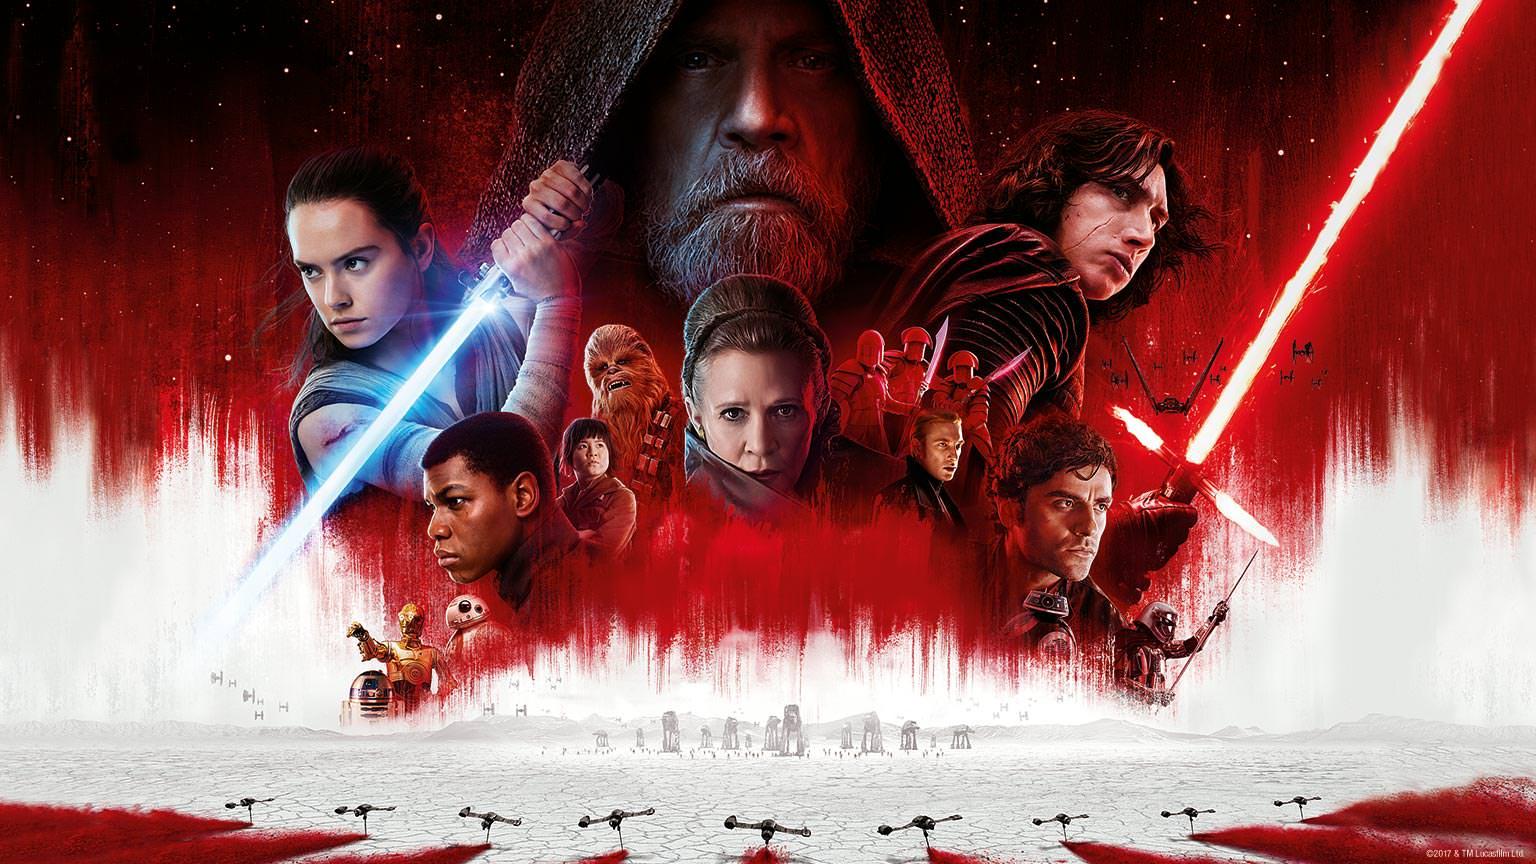 My take on Star Wars: The Last Jedi